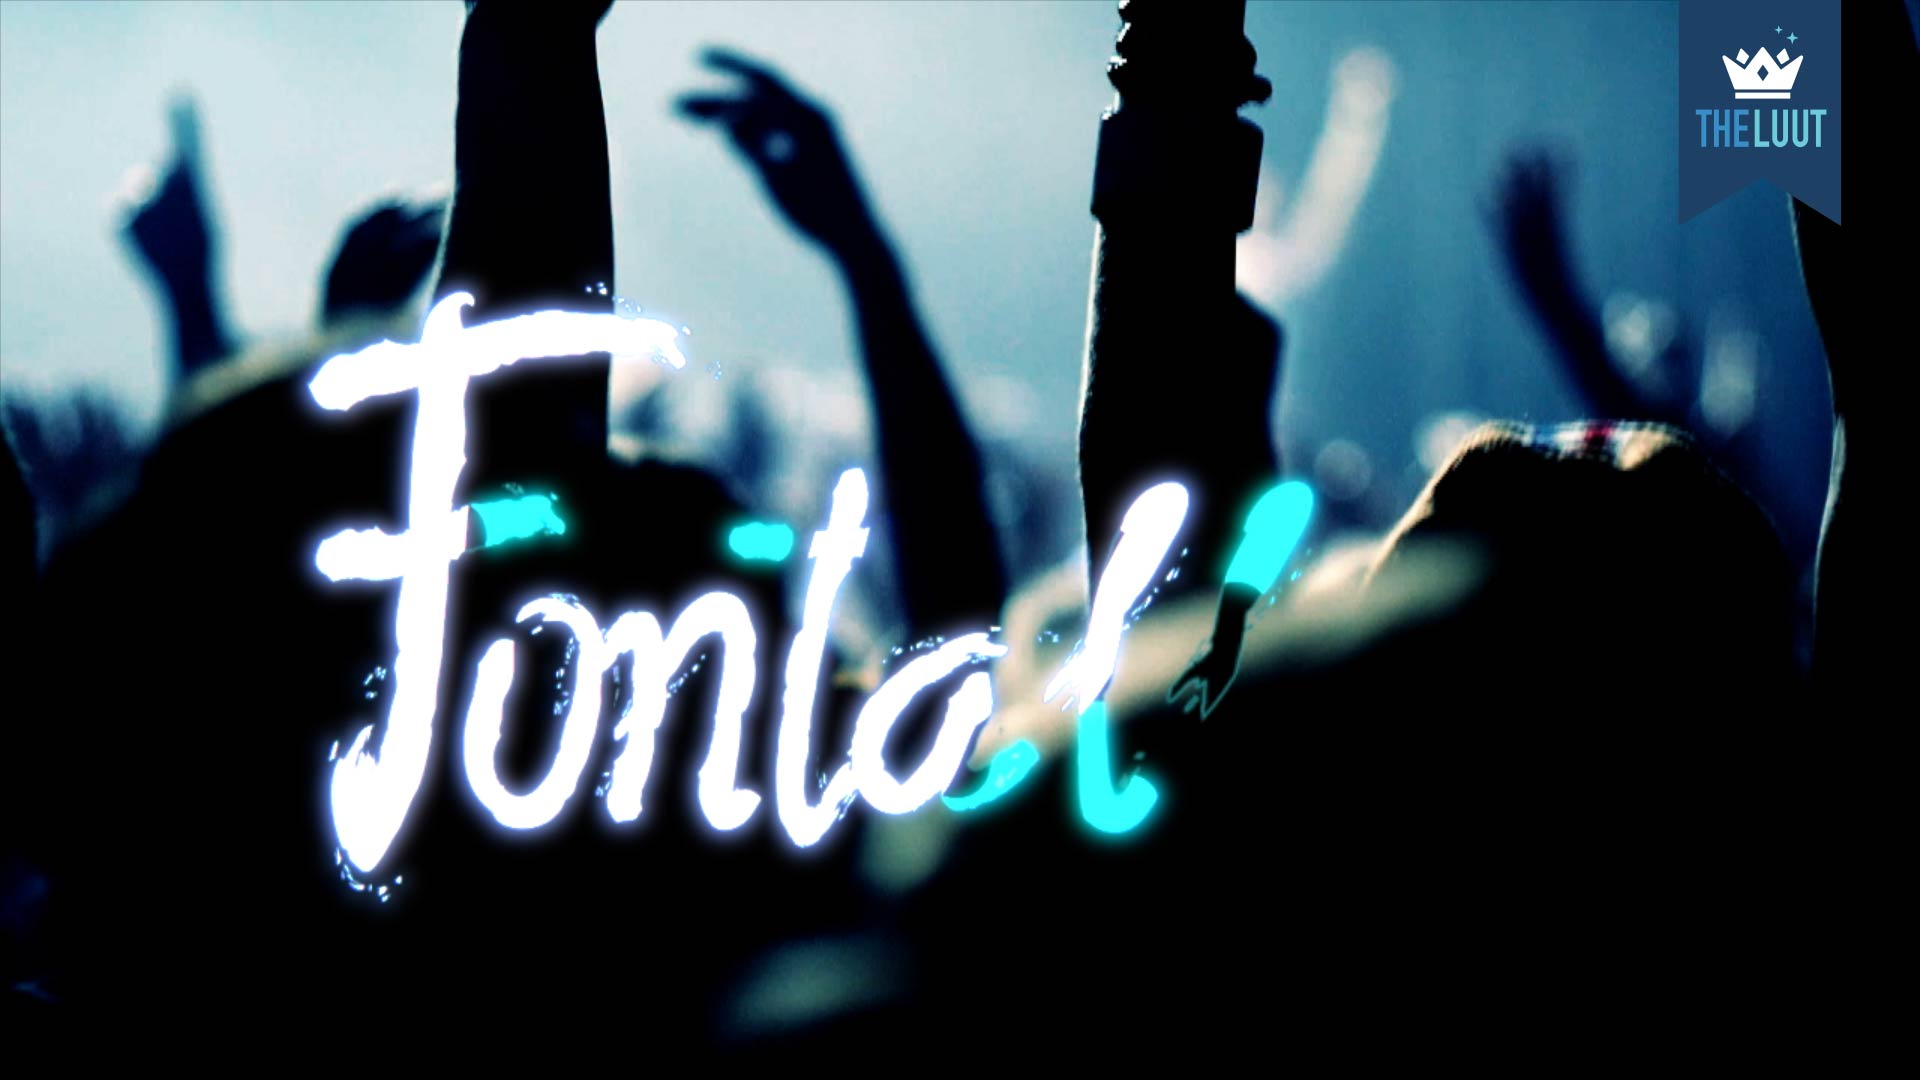 Fontallica promo image 02